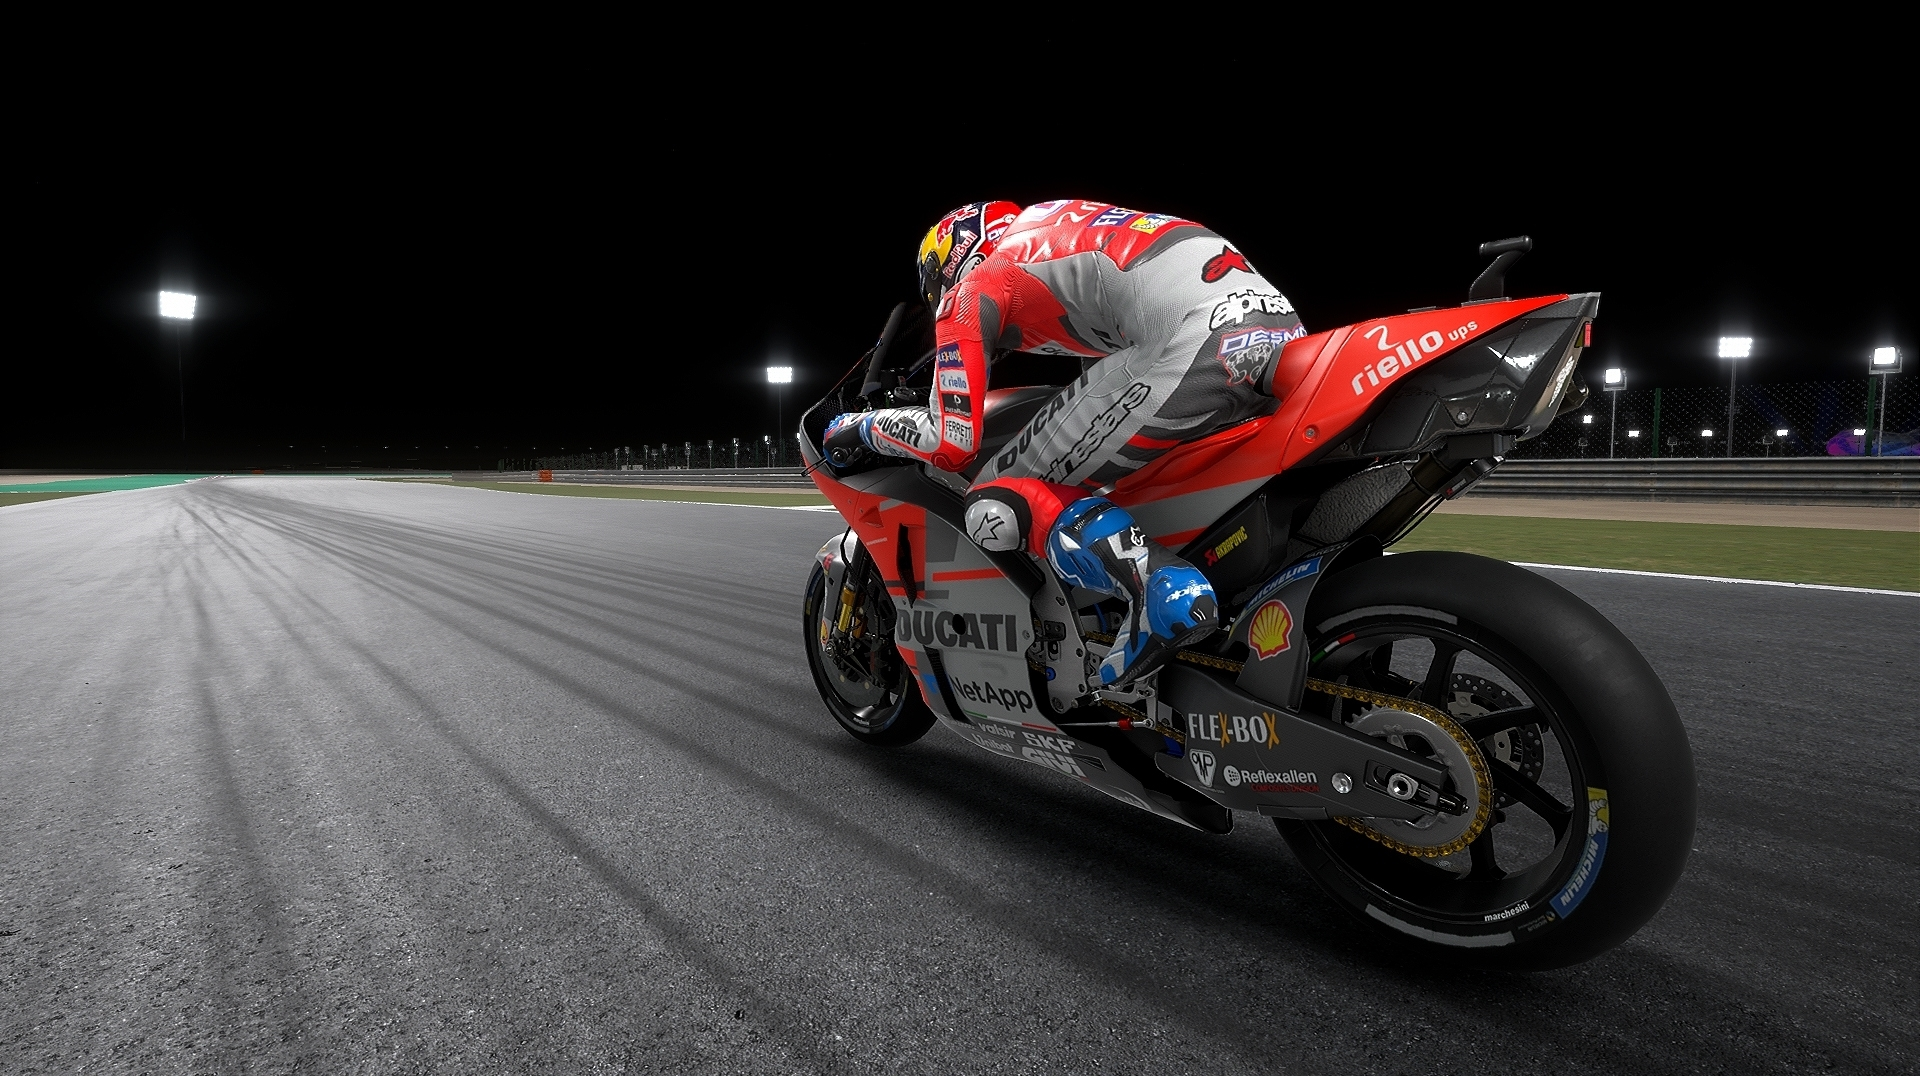 MotoGP 19 - Un trailer mostra l'intelligenza artificiale A.N.N.A.